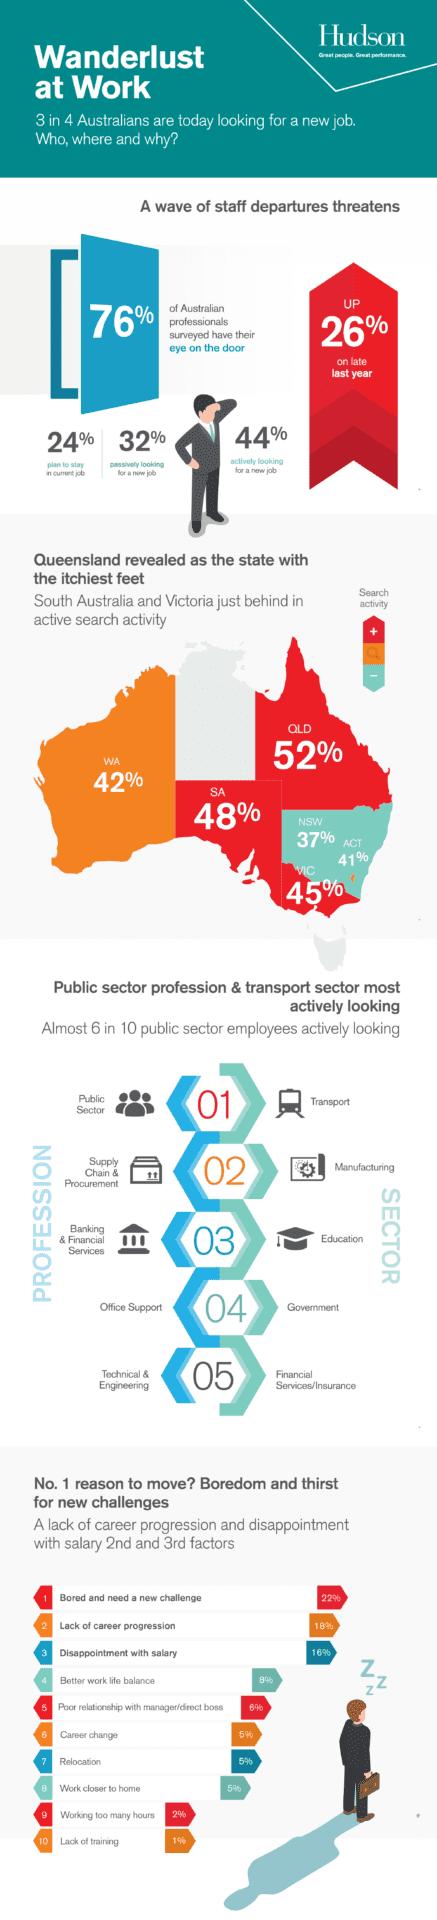 Hudson Report - Wanderlust at work - Infographic